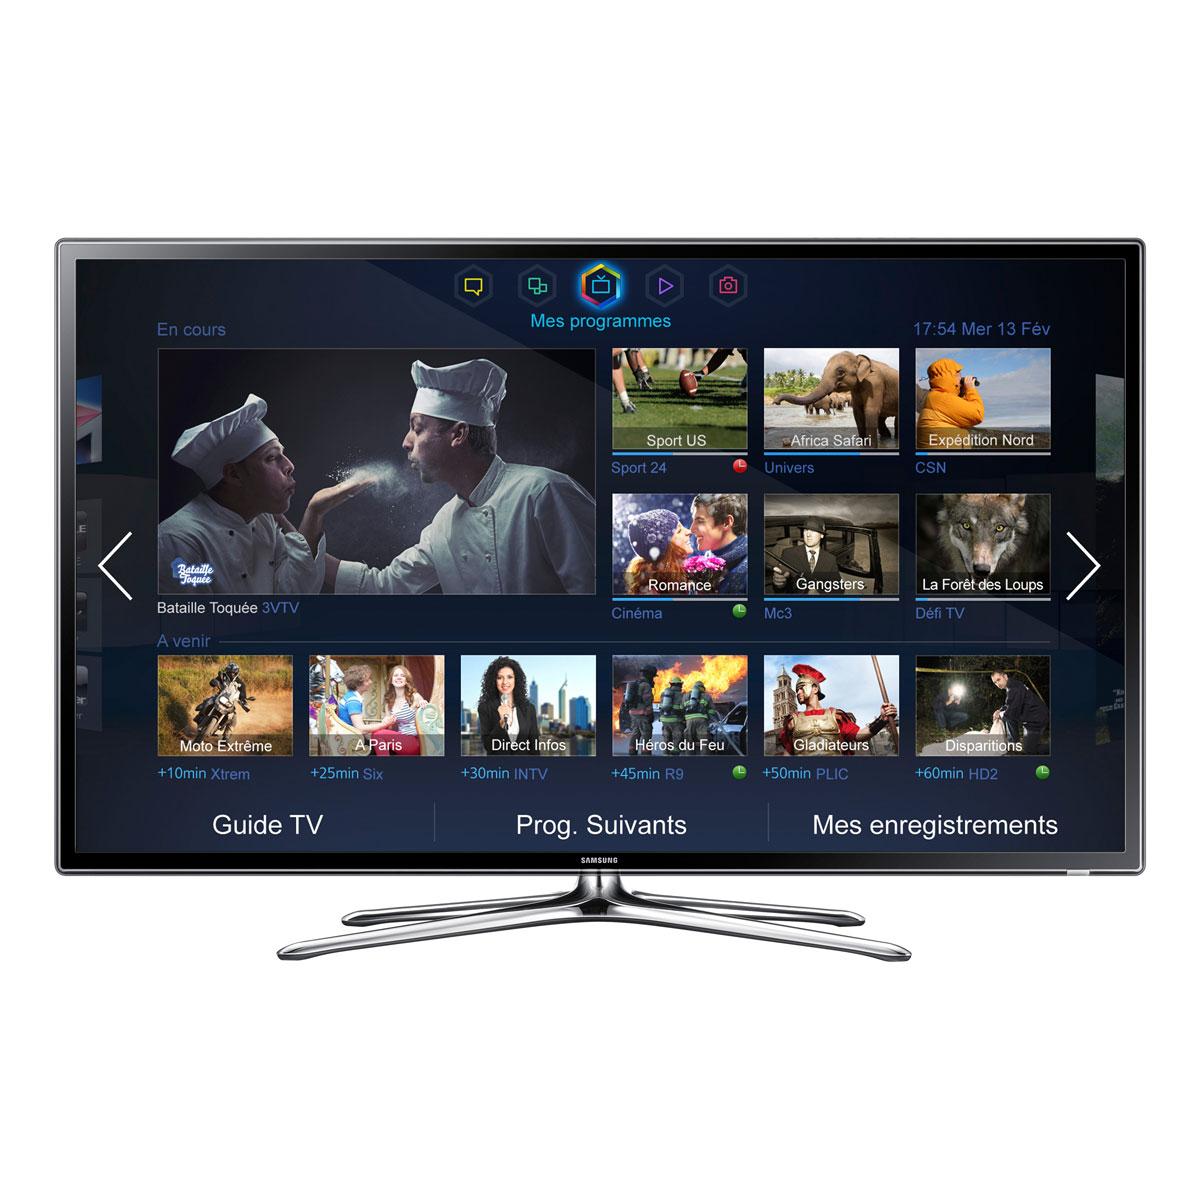 "TV Samsung UE55F6320 Téléviseur LED Full HD 3D 55"" (140 cm) 16/9 - 1920 x 1080 pixels - Tuner TNT HD et Câble - 200 Hz - DLNA Wi-Fi - HDTV 1080p"